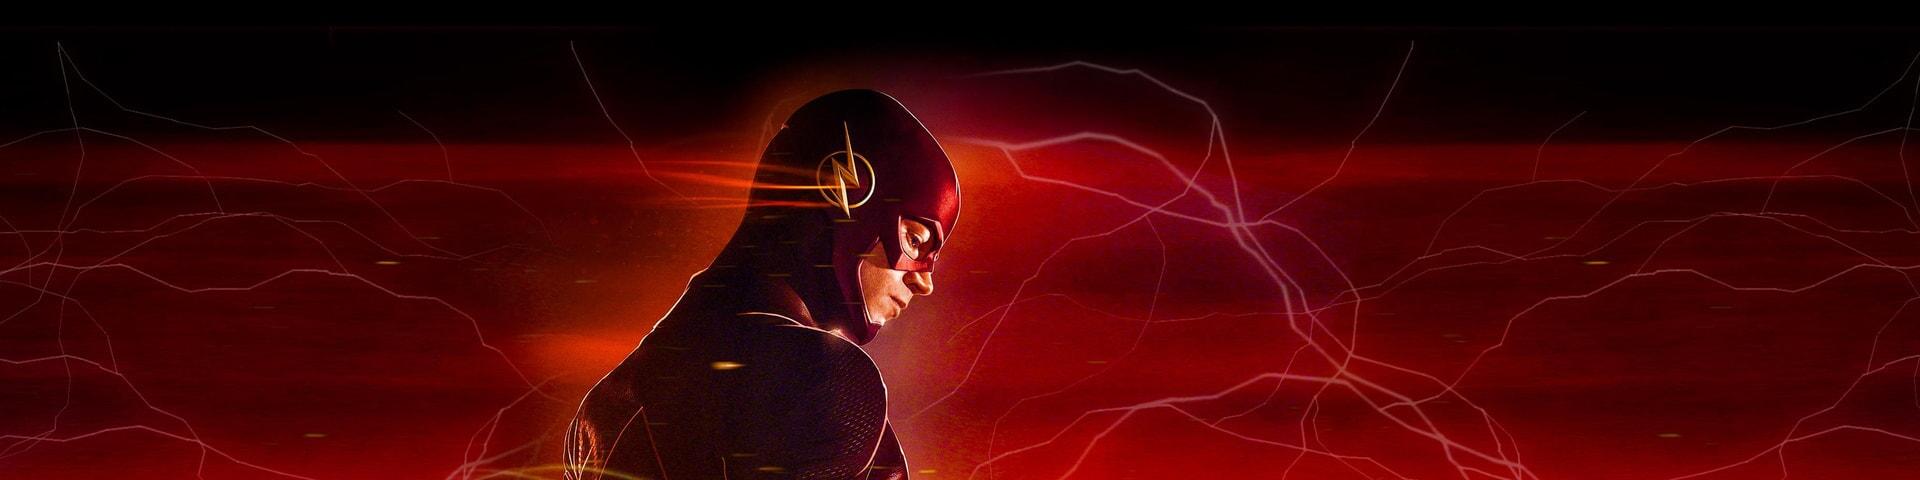 WarnerBros com | The Flash | TV